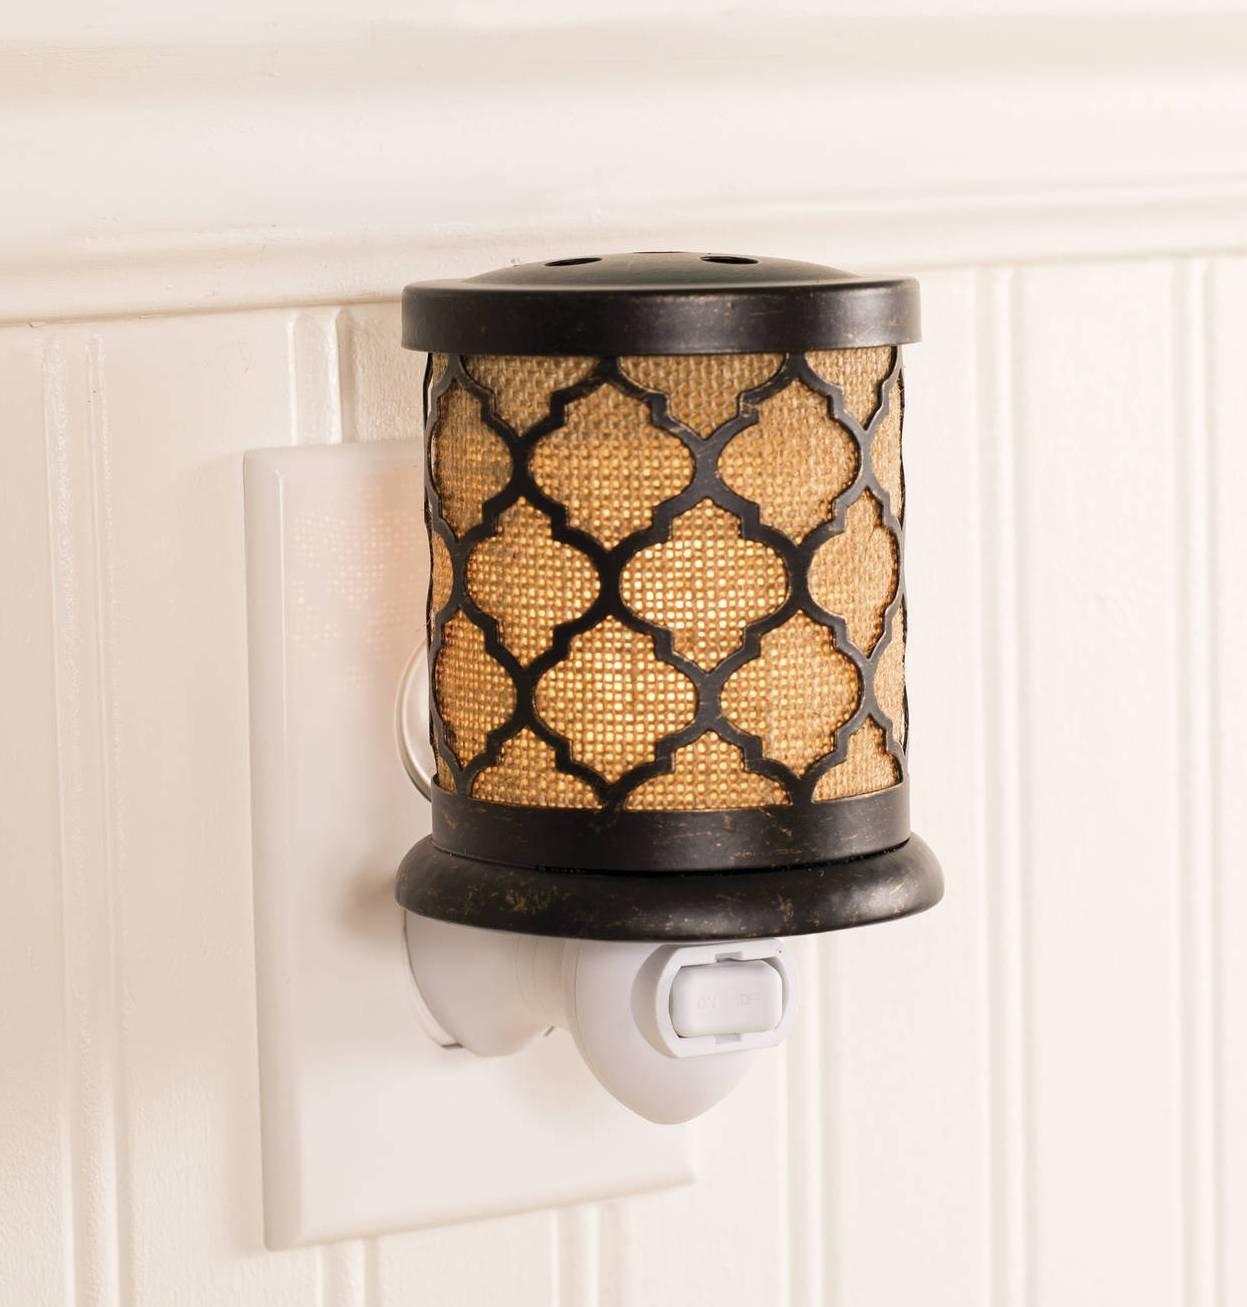 Wax Warmer ElectricタルトWarmerプラグin Pluggable Home Fragrance Diffuser (モロッコ黄麻布) B01I5MF036